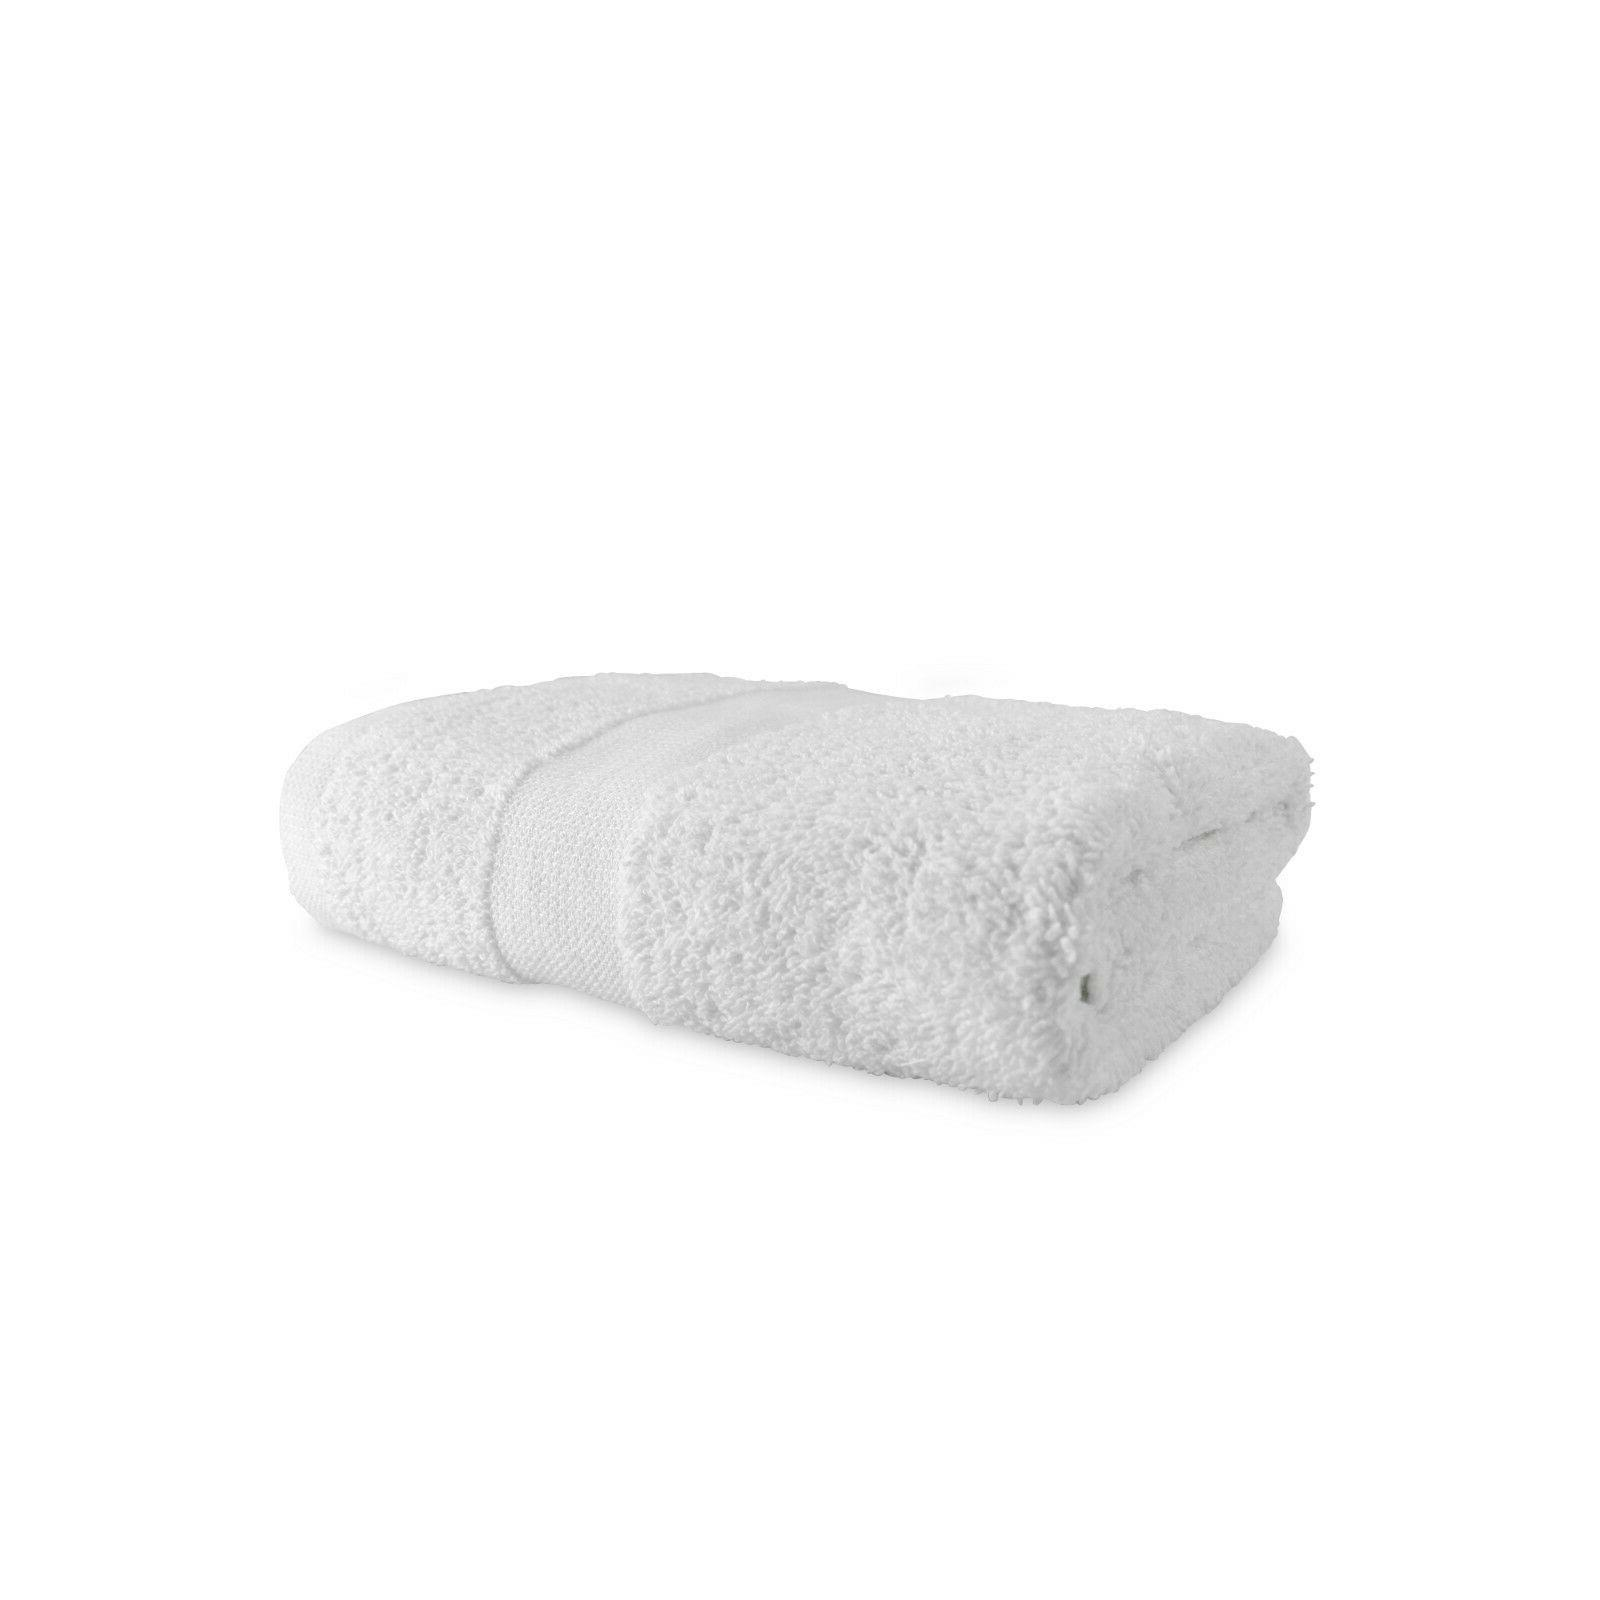 12 Pack of Admiral Hand - 16 - Bulk Bathroom Towels